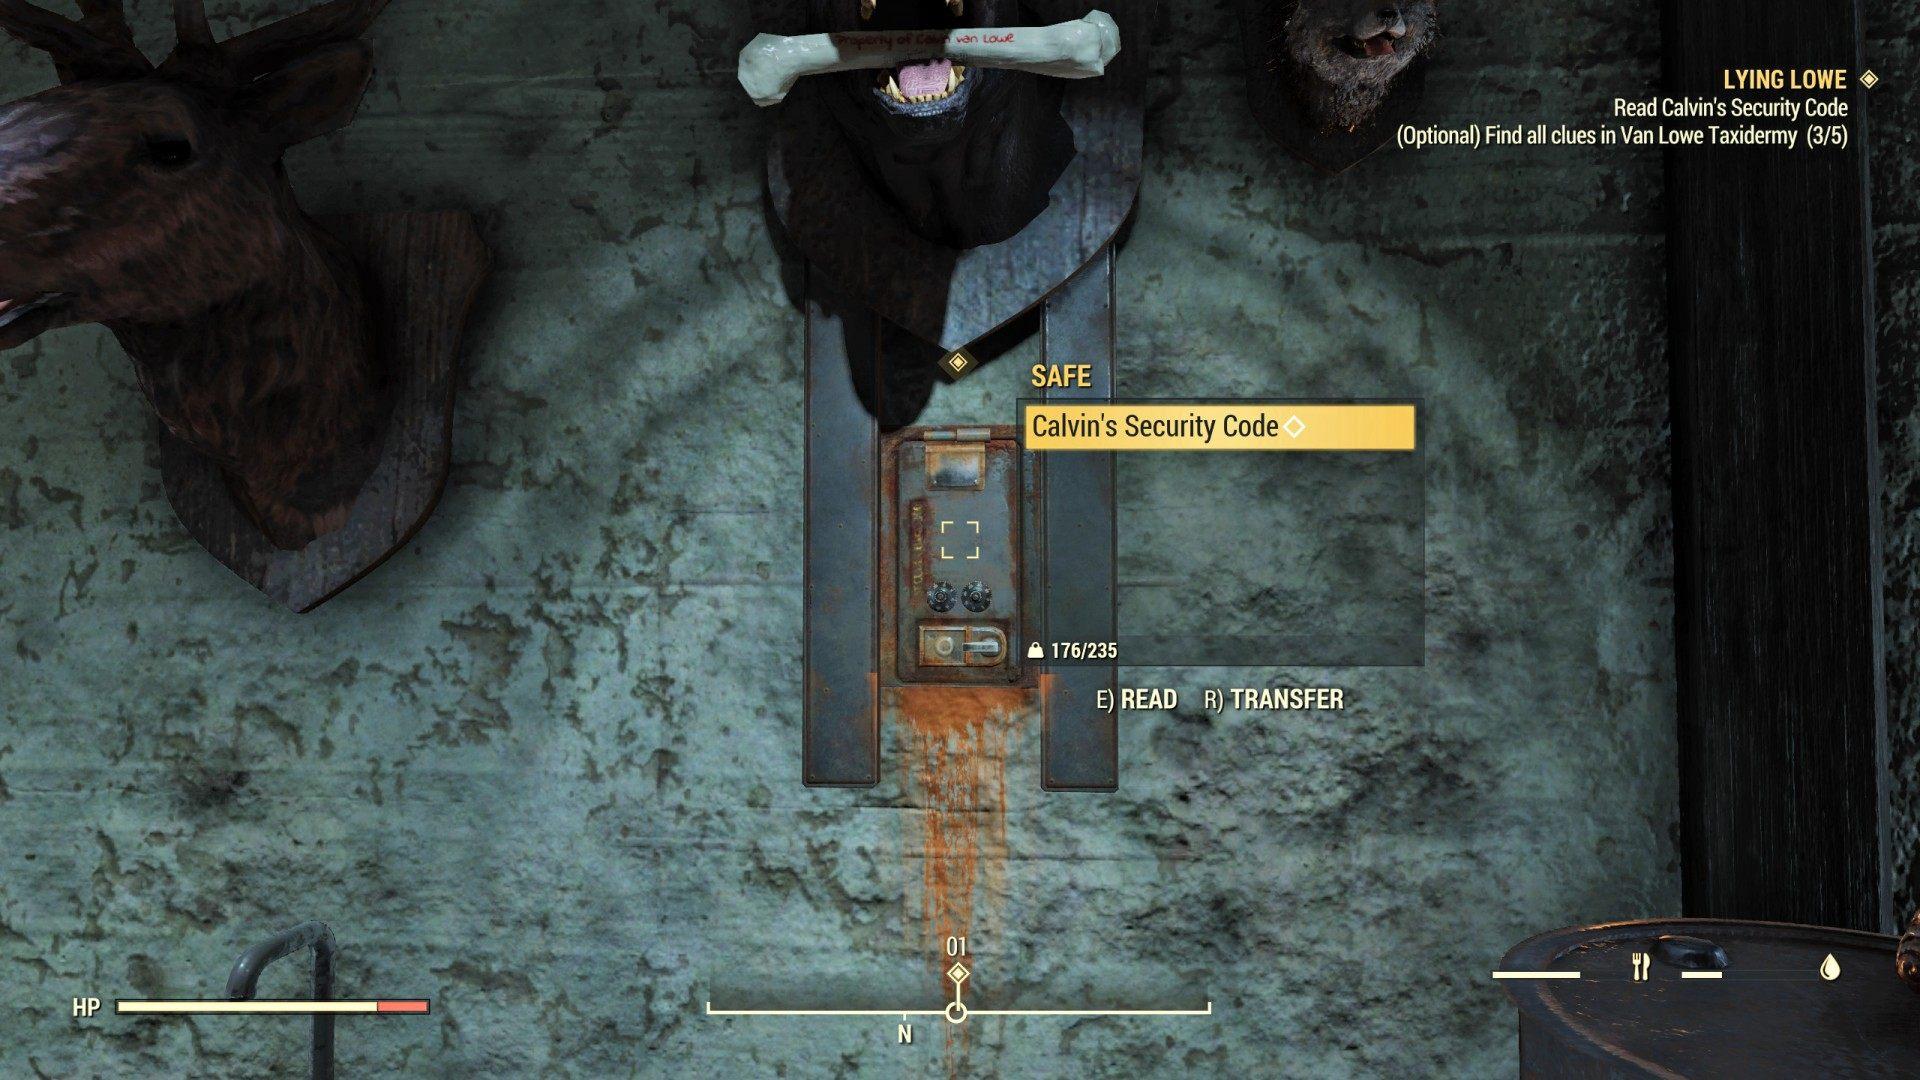 Lying Lowe Fallout 76 Quest